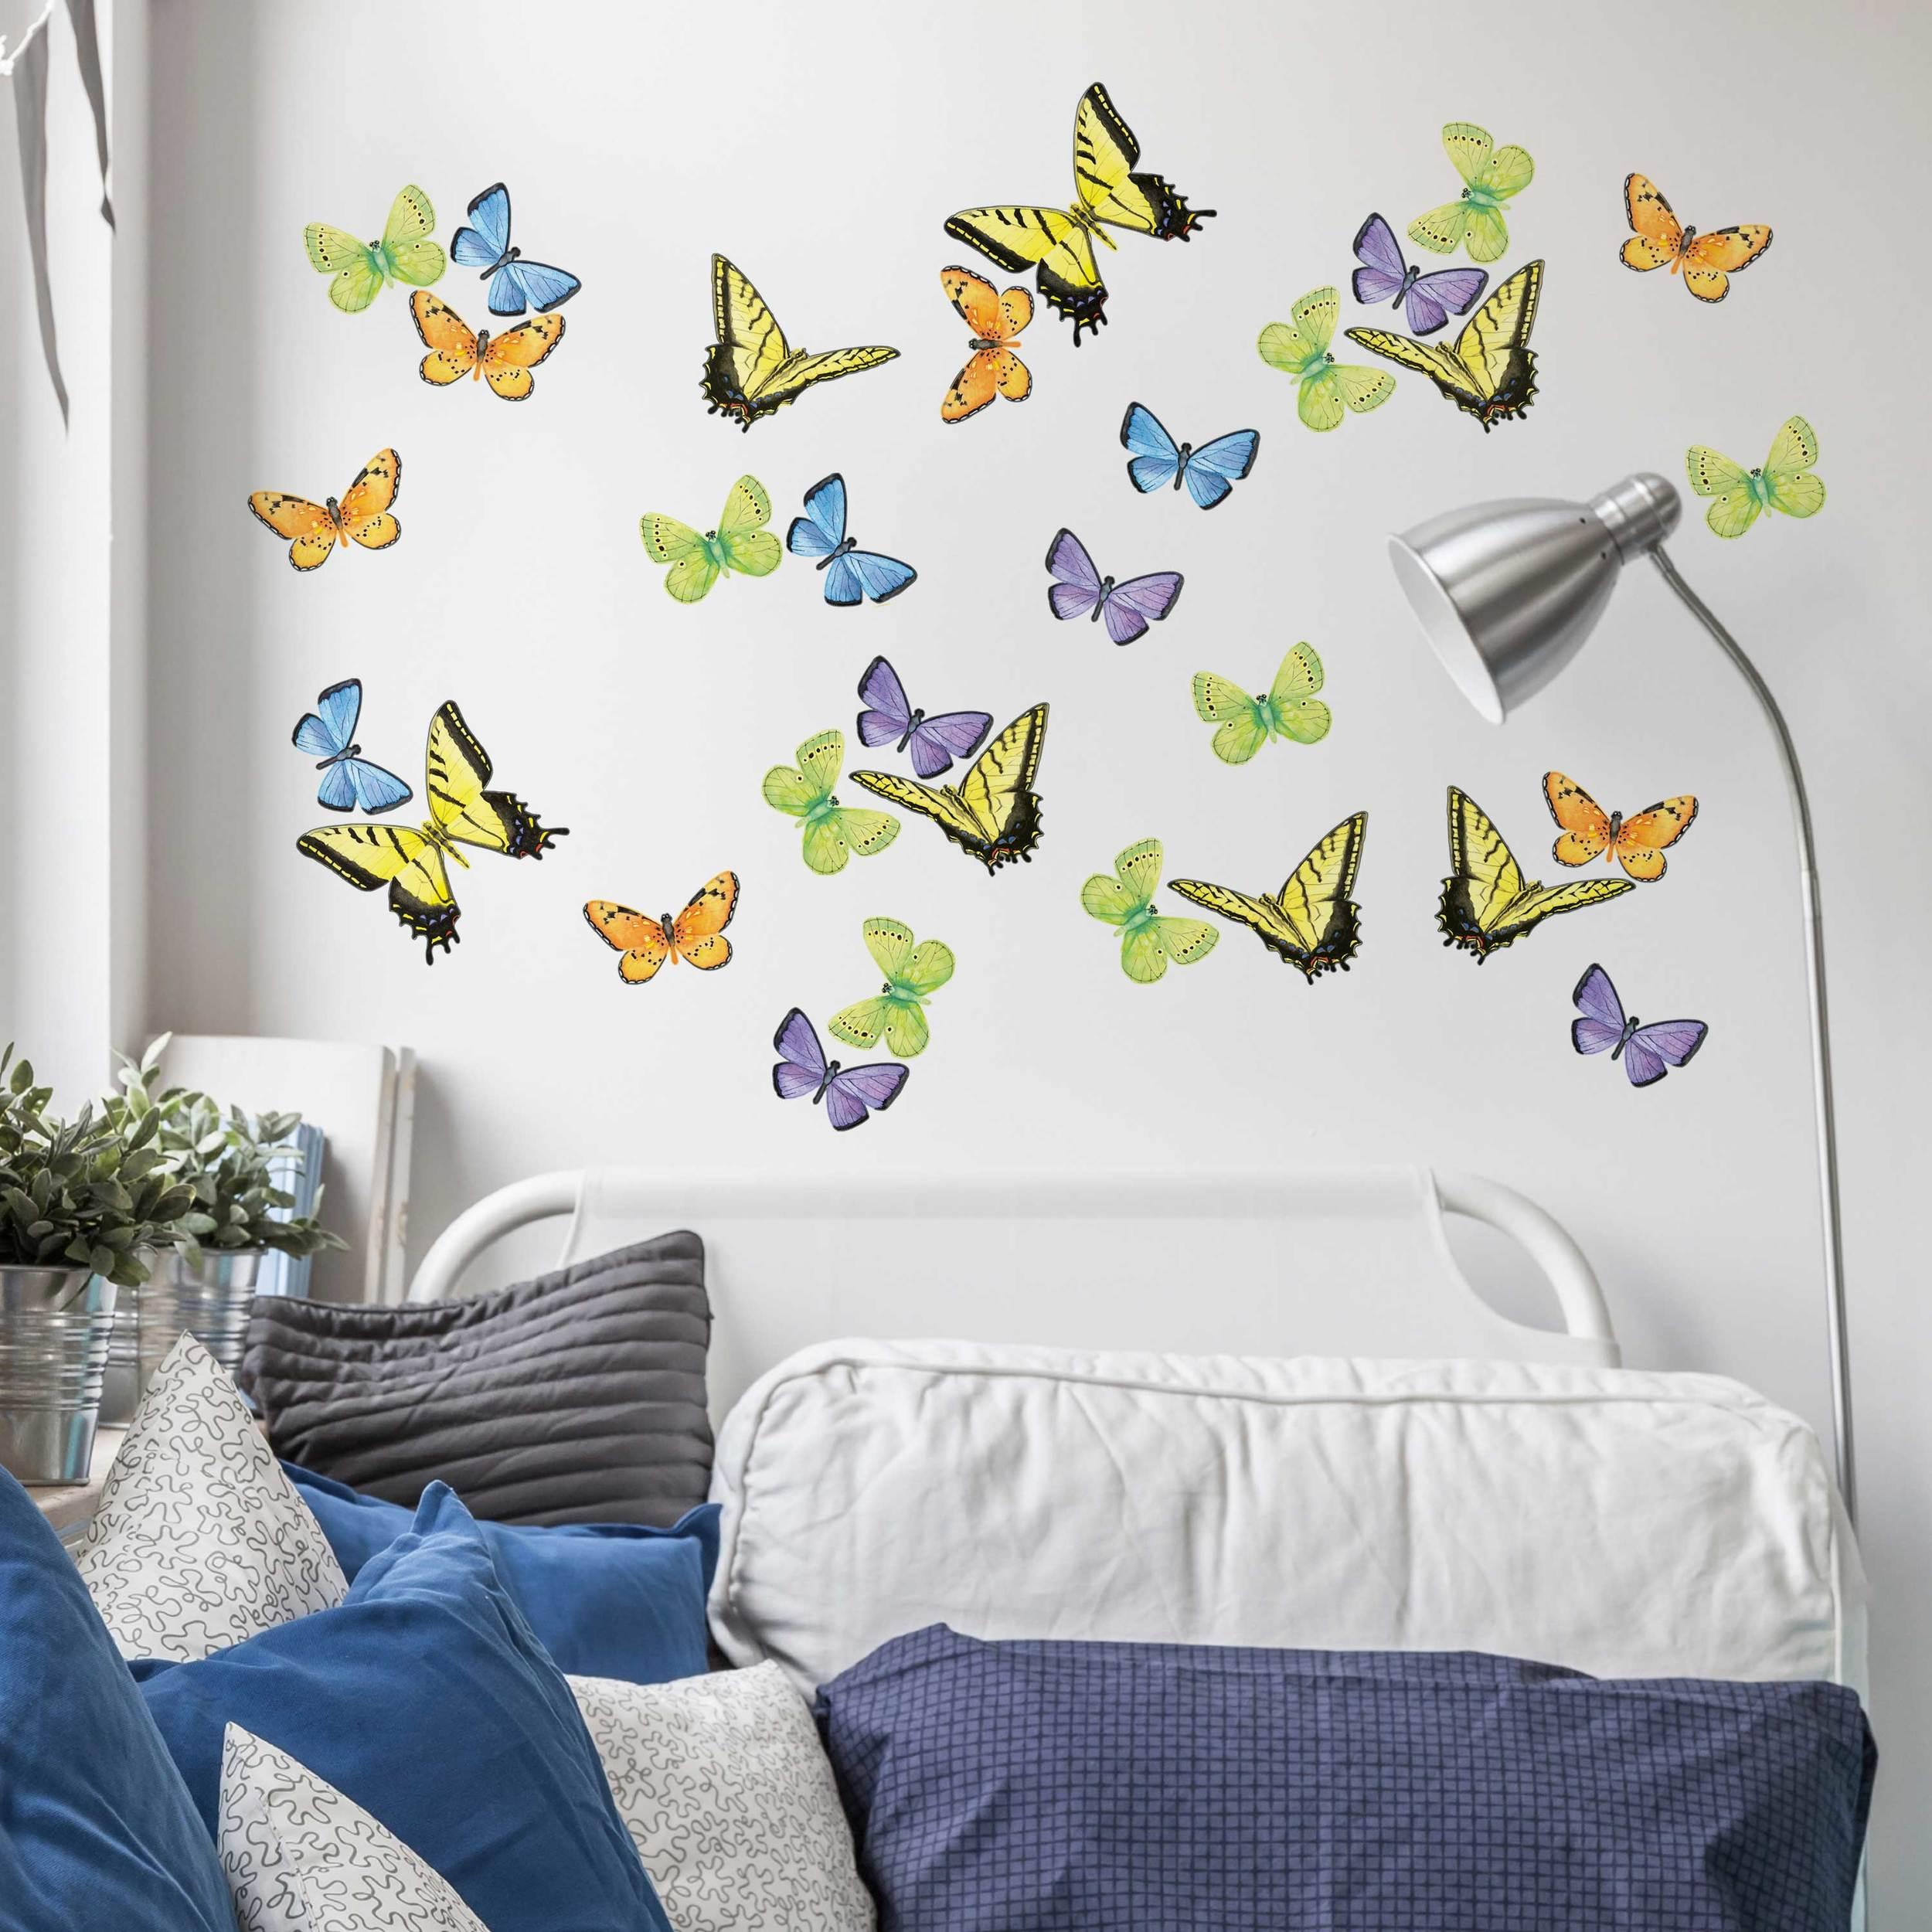 Butterflies_inuse.jpg